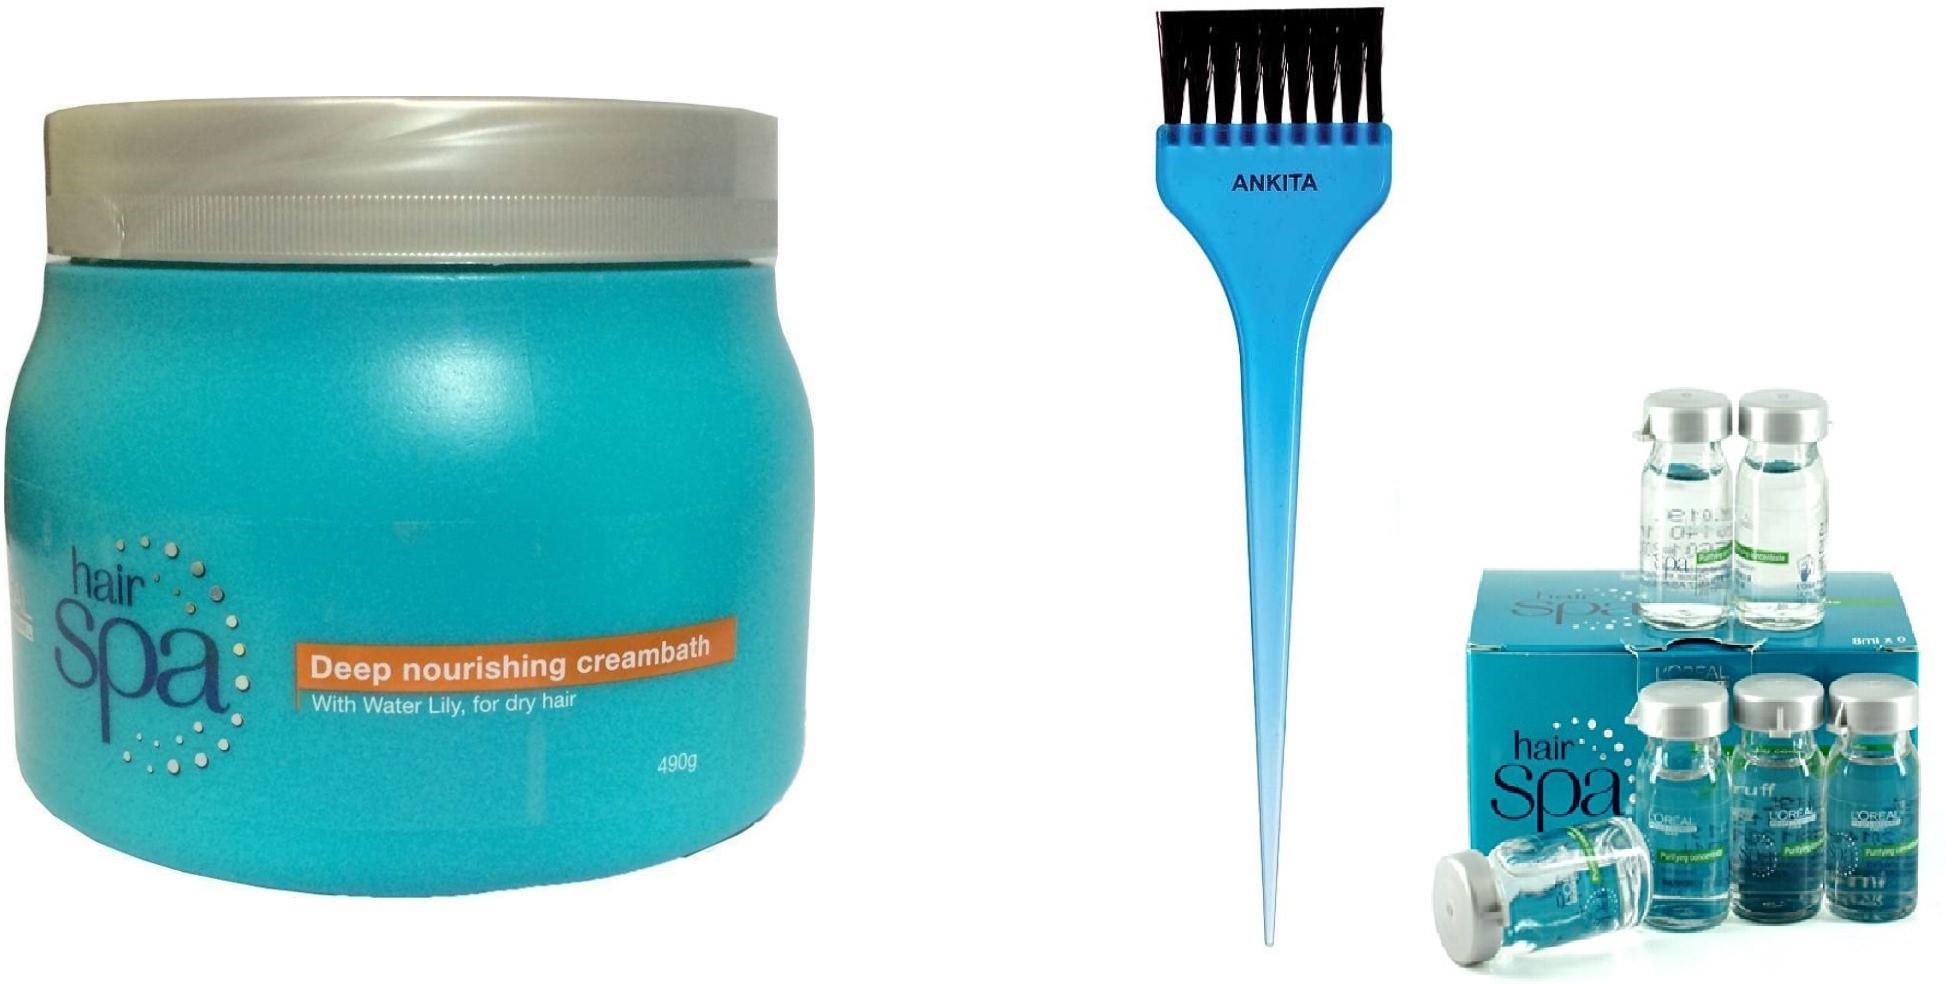 LOreal Hair Spa Deep Nourishing Creambath(Set of 3)